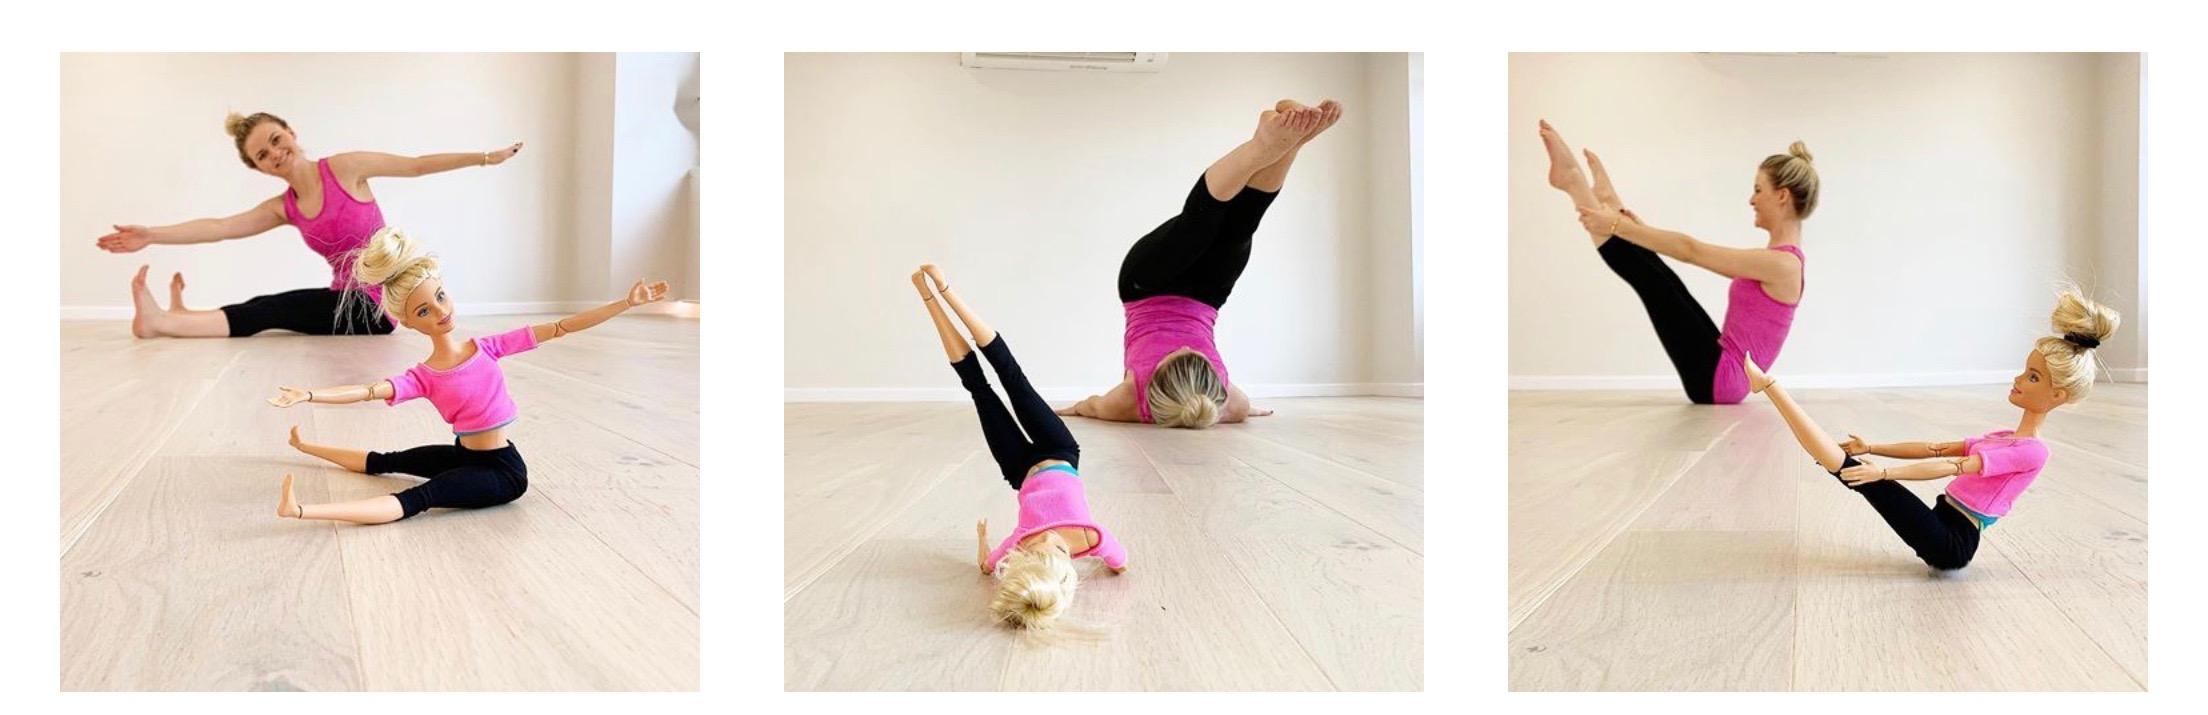 March-Matness-2019-Superstars-Pilates-with-Harriett